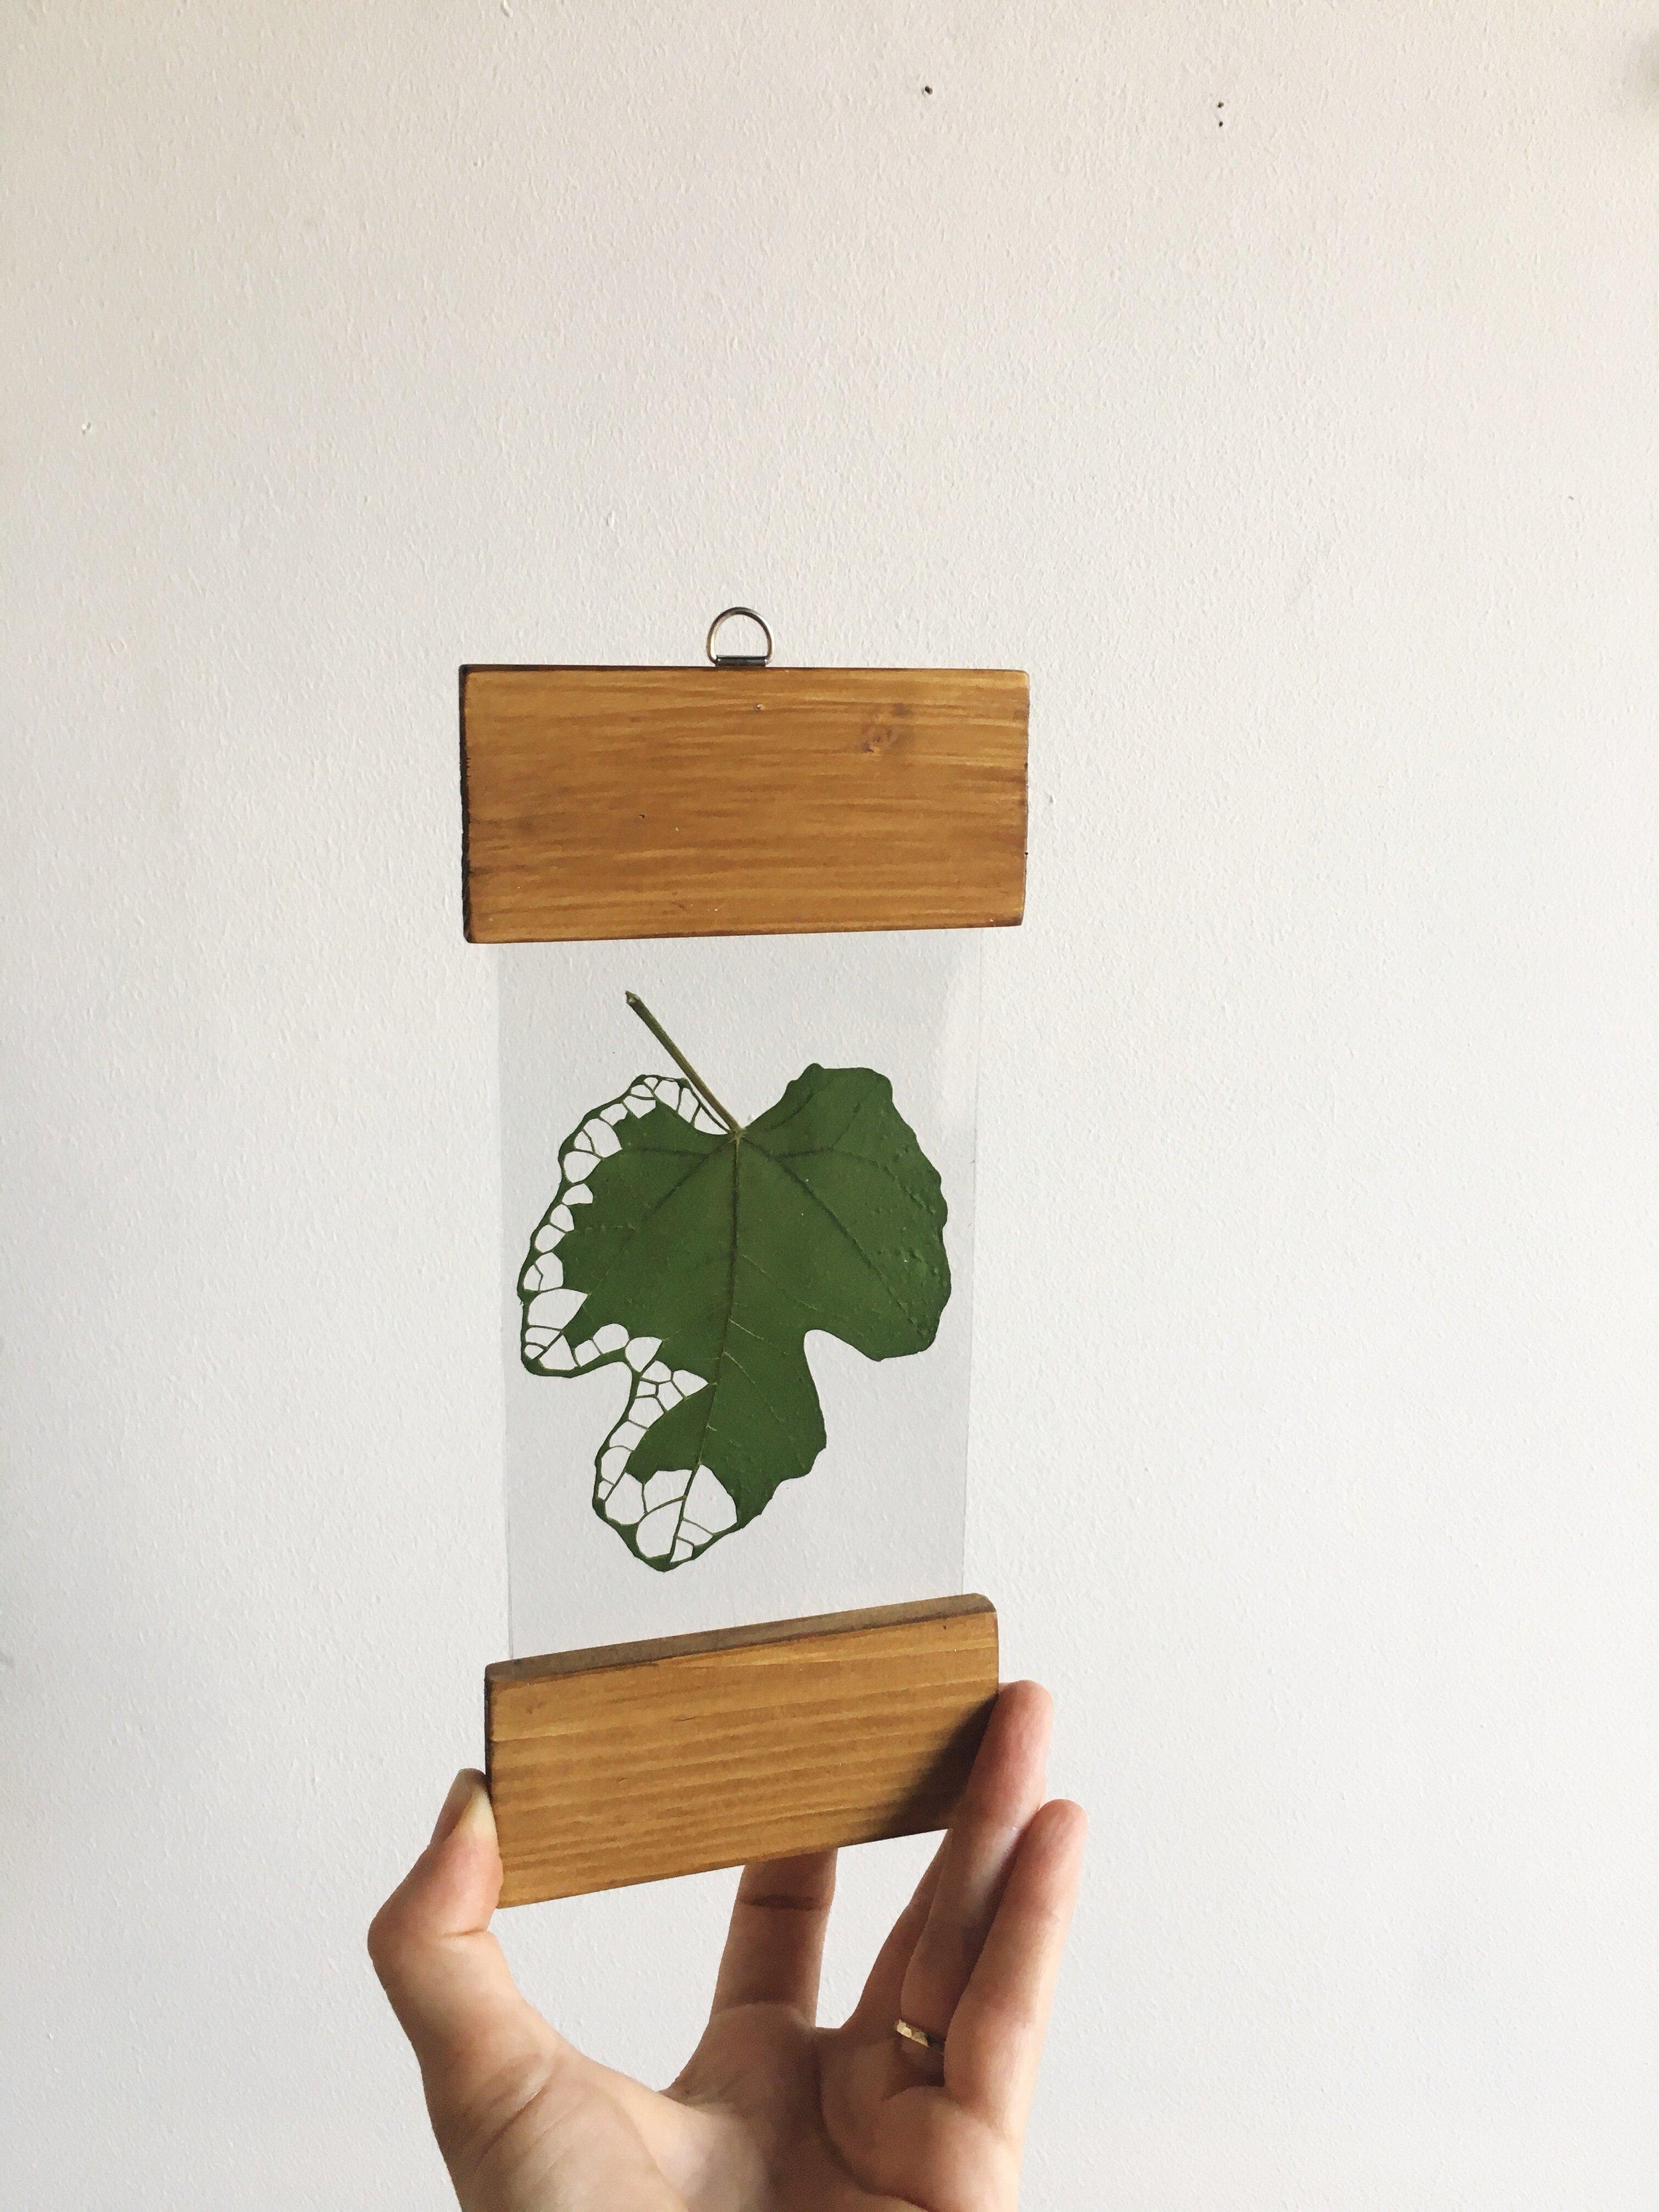 leaf frame prototype.JPG